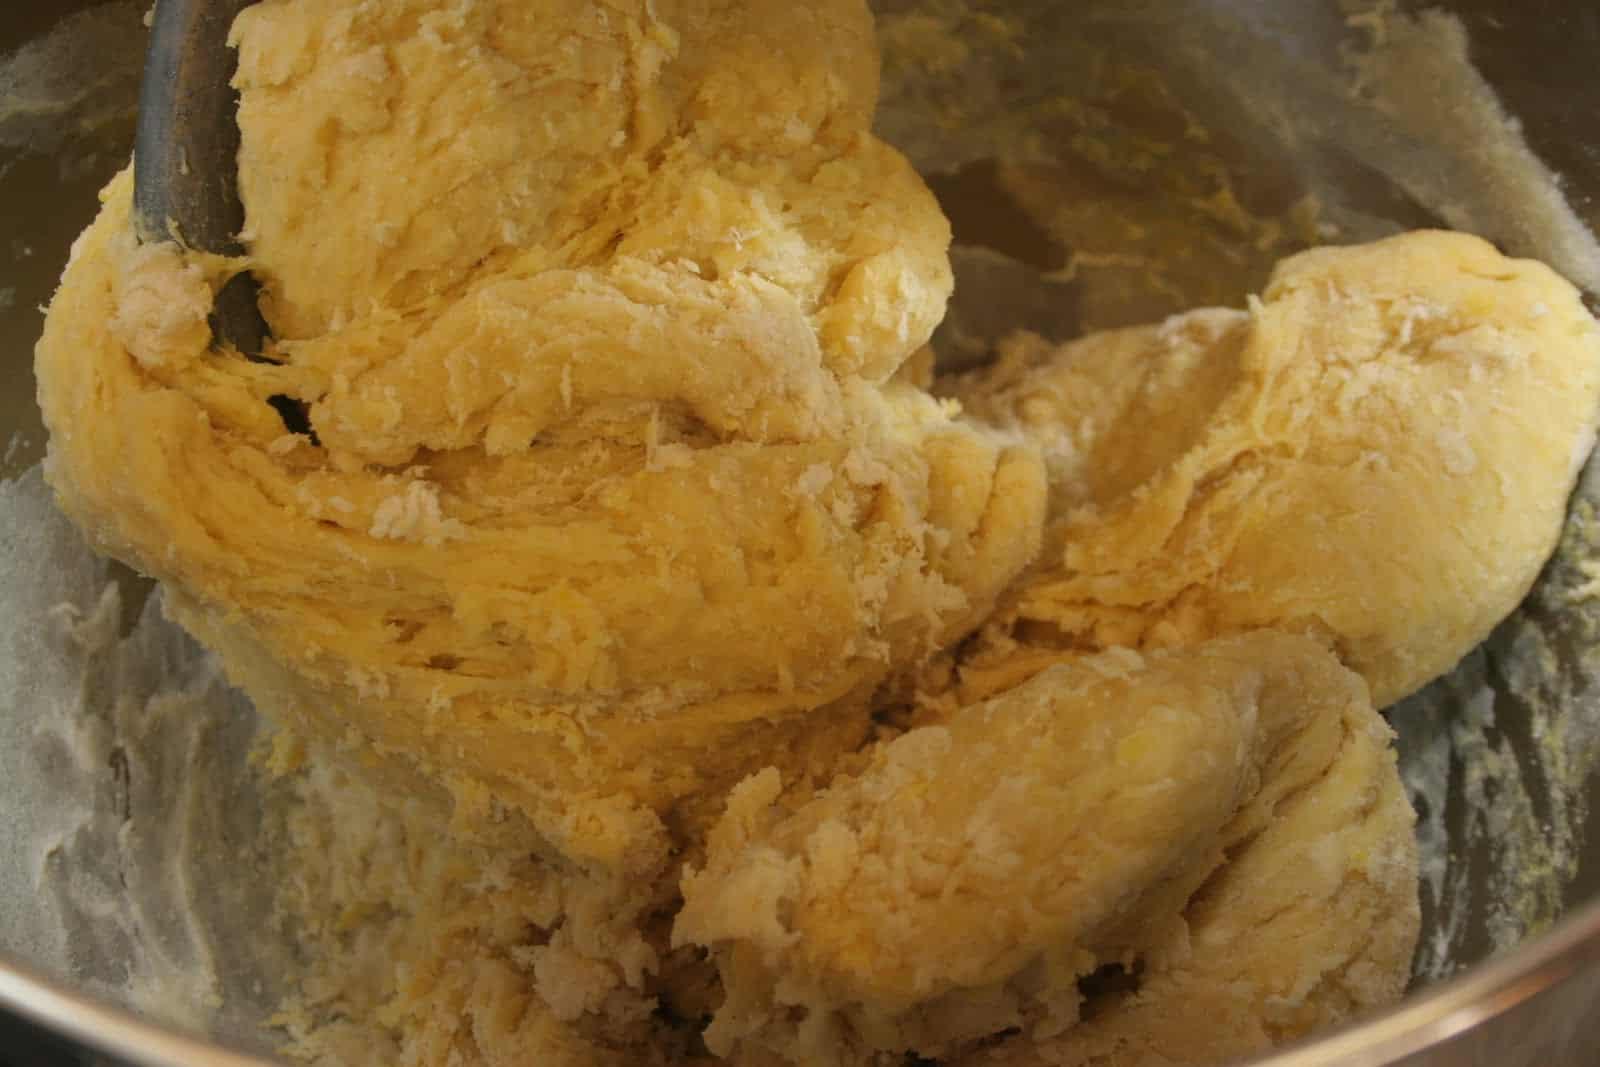 Challah bread dough being mixed